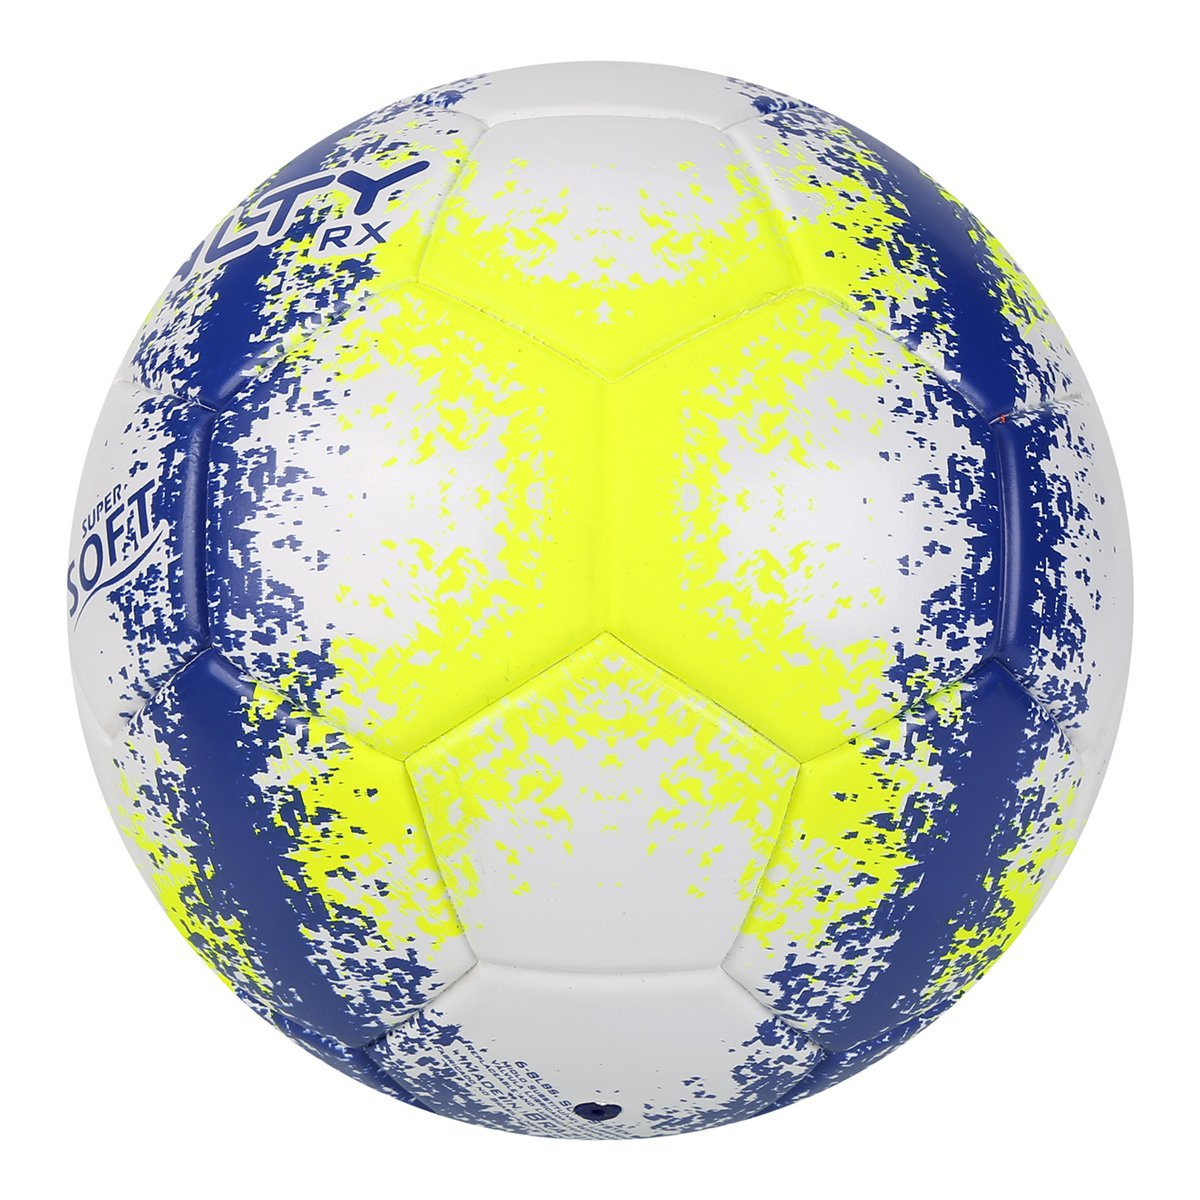 f1795f2906 Bola Futsal Penalty RX 100 R3 Fusion VIII - Branco e Amarelo ...